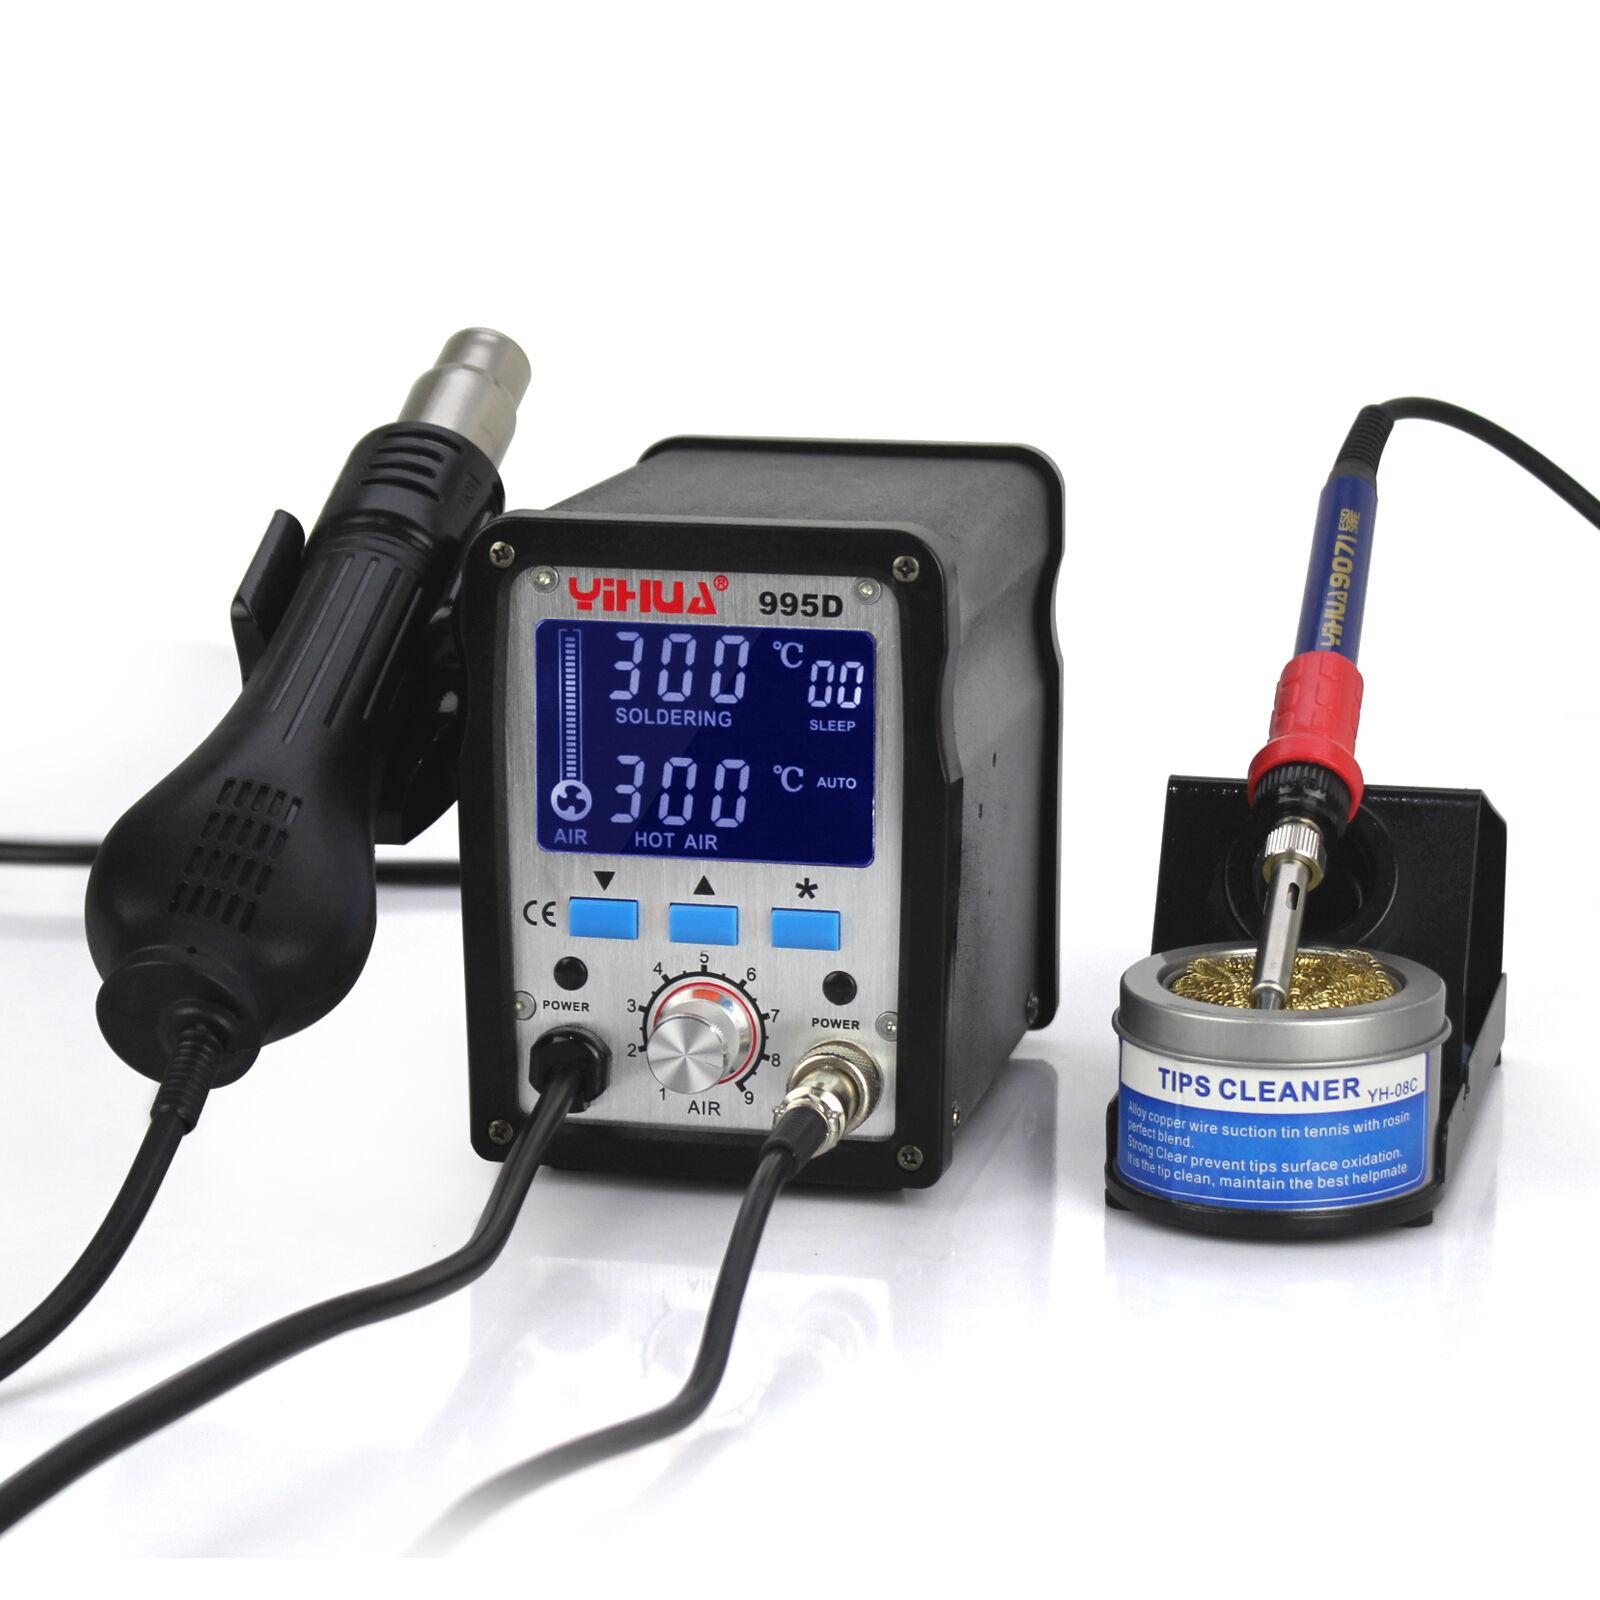 FR-PHONECASEONLINE YiHua 995d LCD SMD hot air station 110v USA